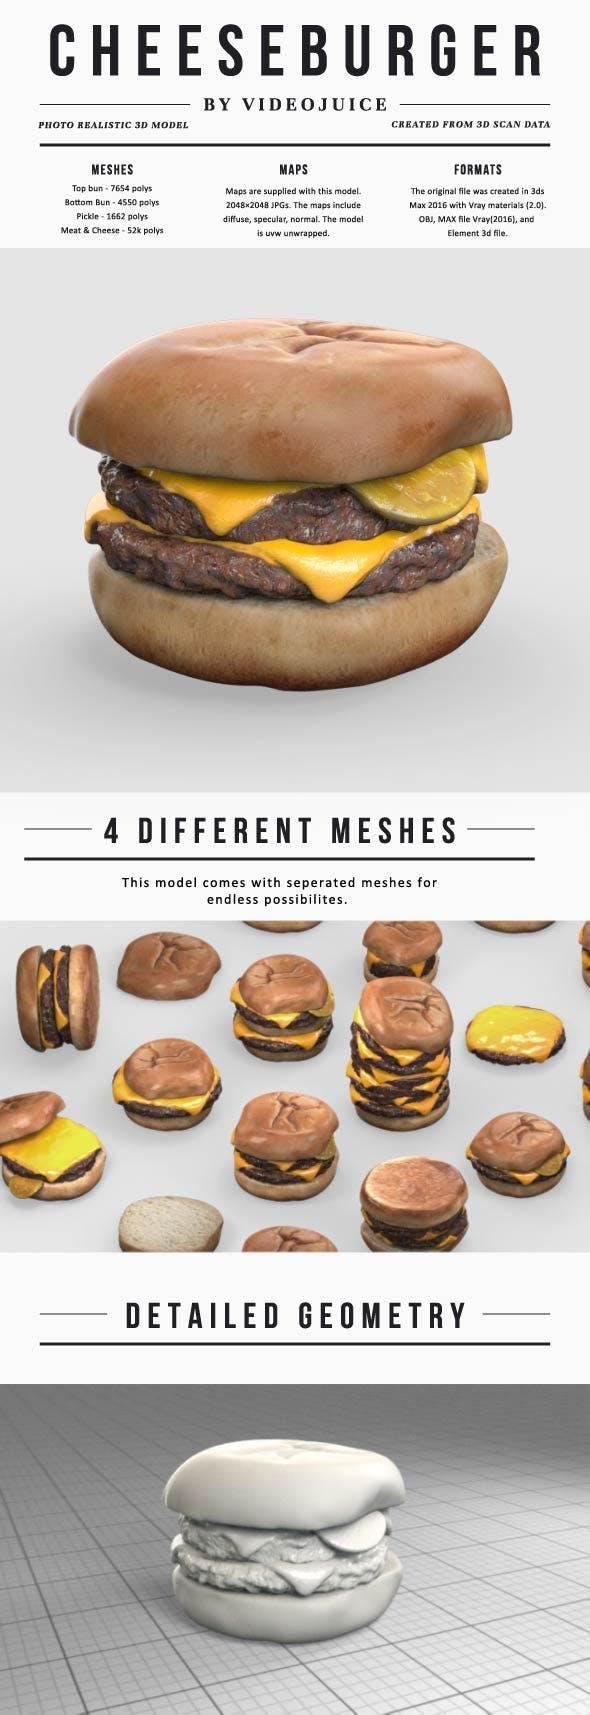 Cheeseburger - 3DOcean Item for Sale